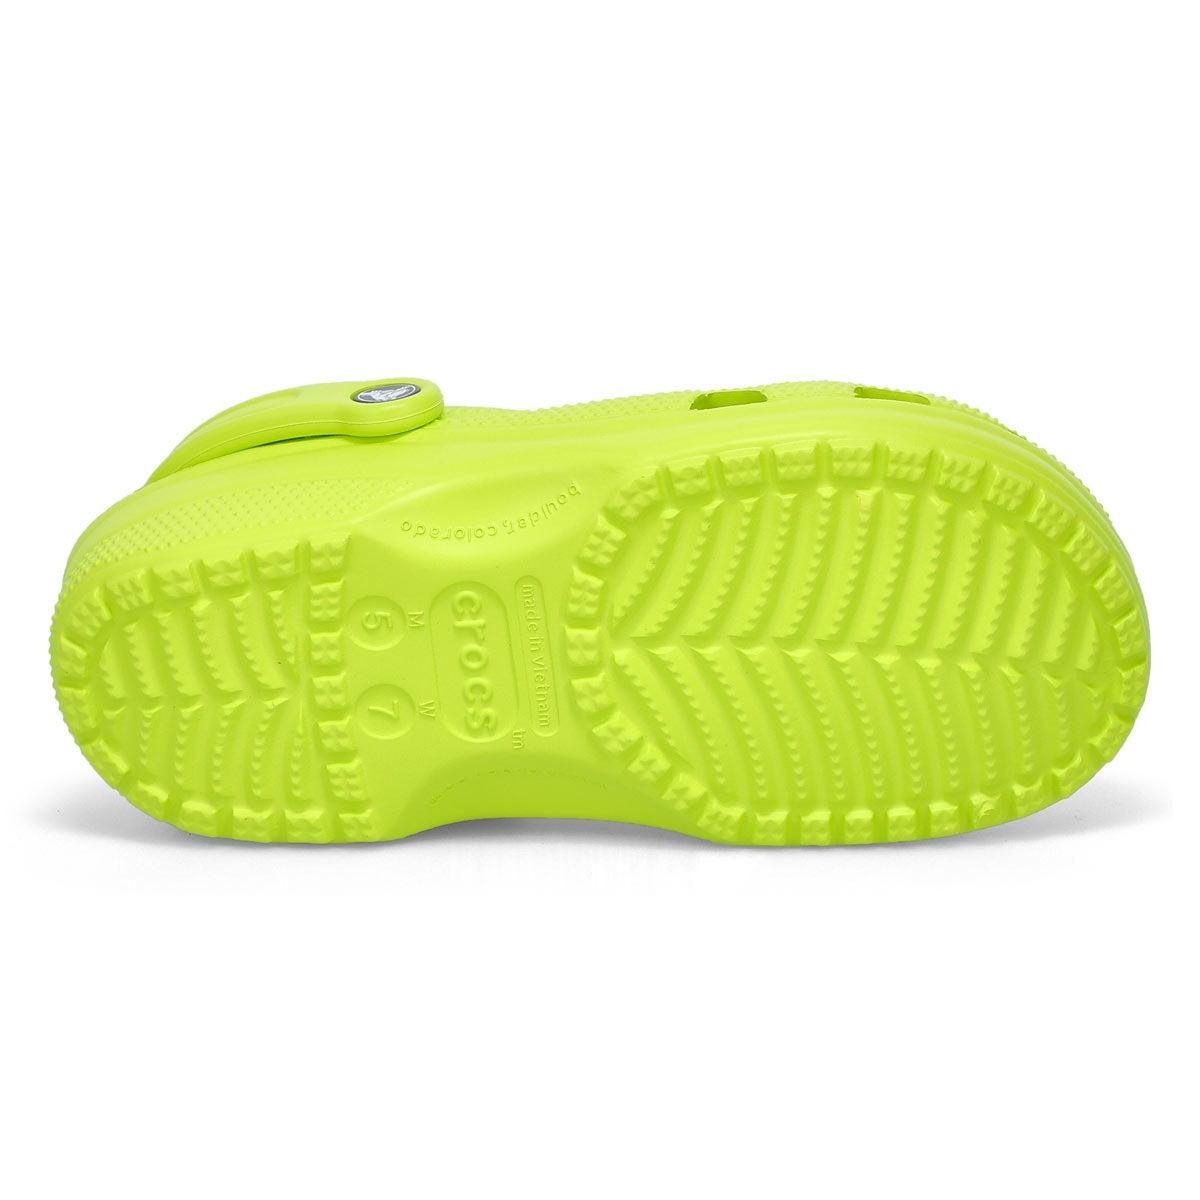 Women's Classic EVA Comfort Clog - Lime Punch